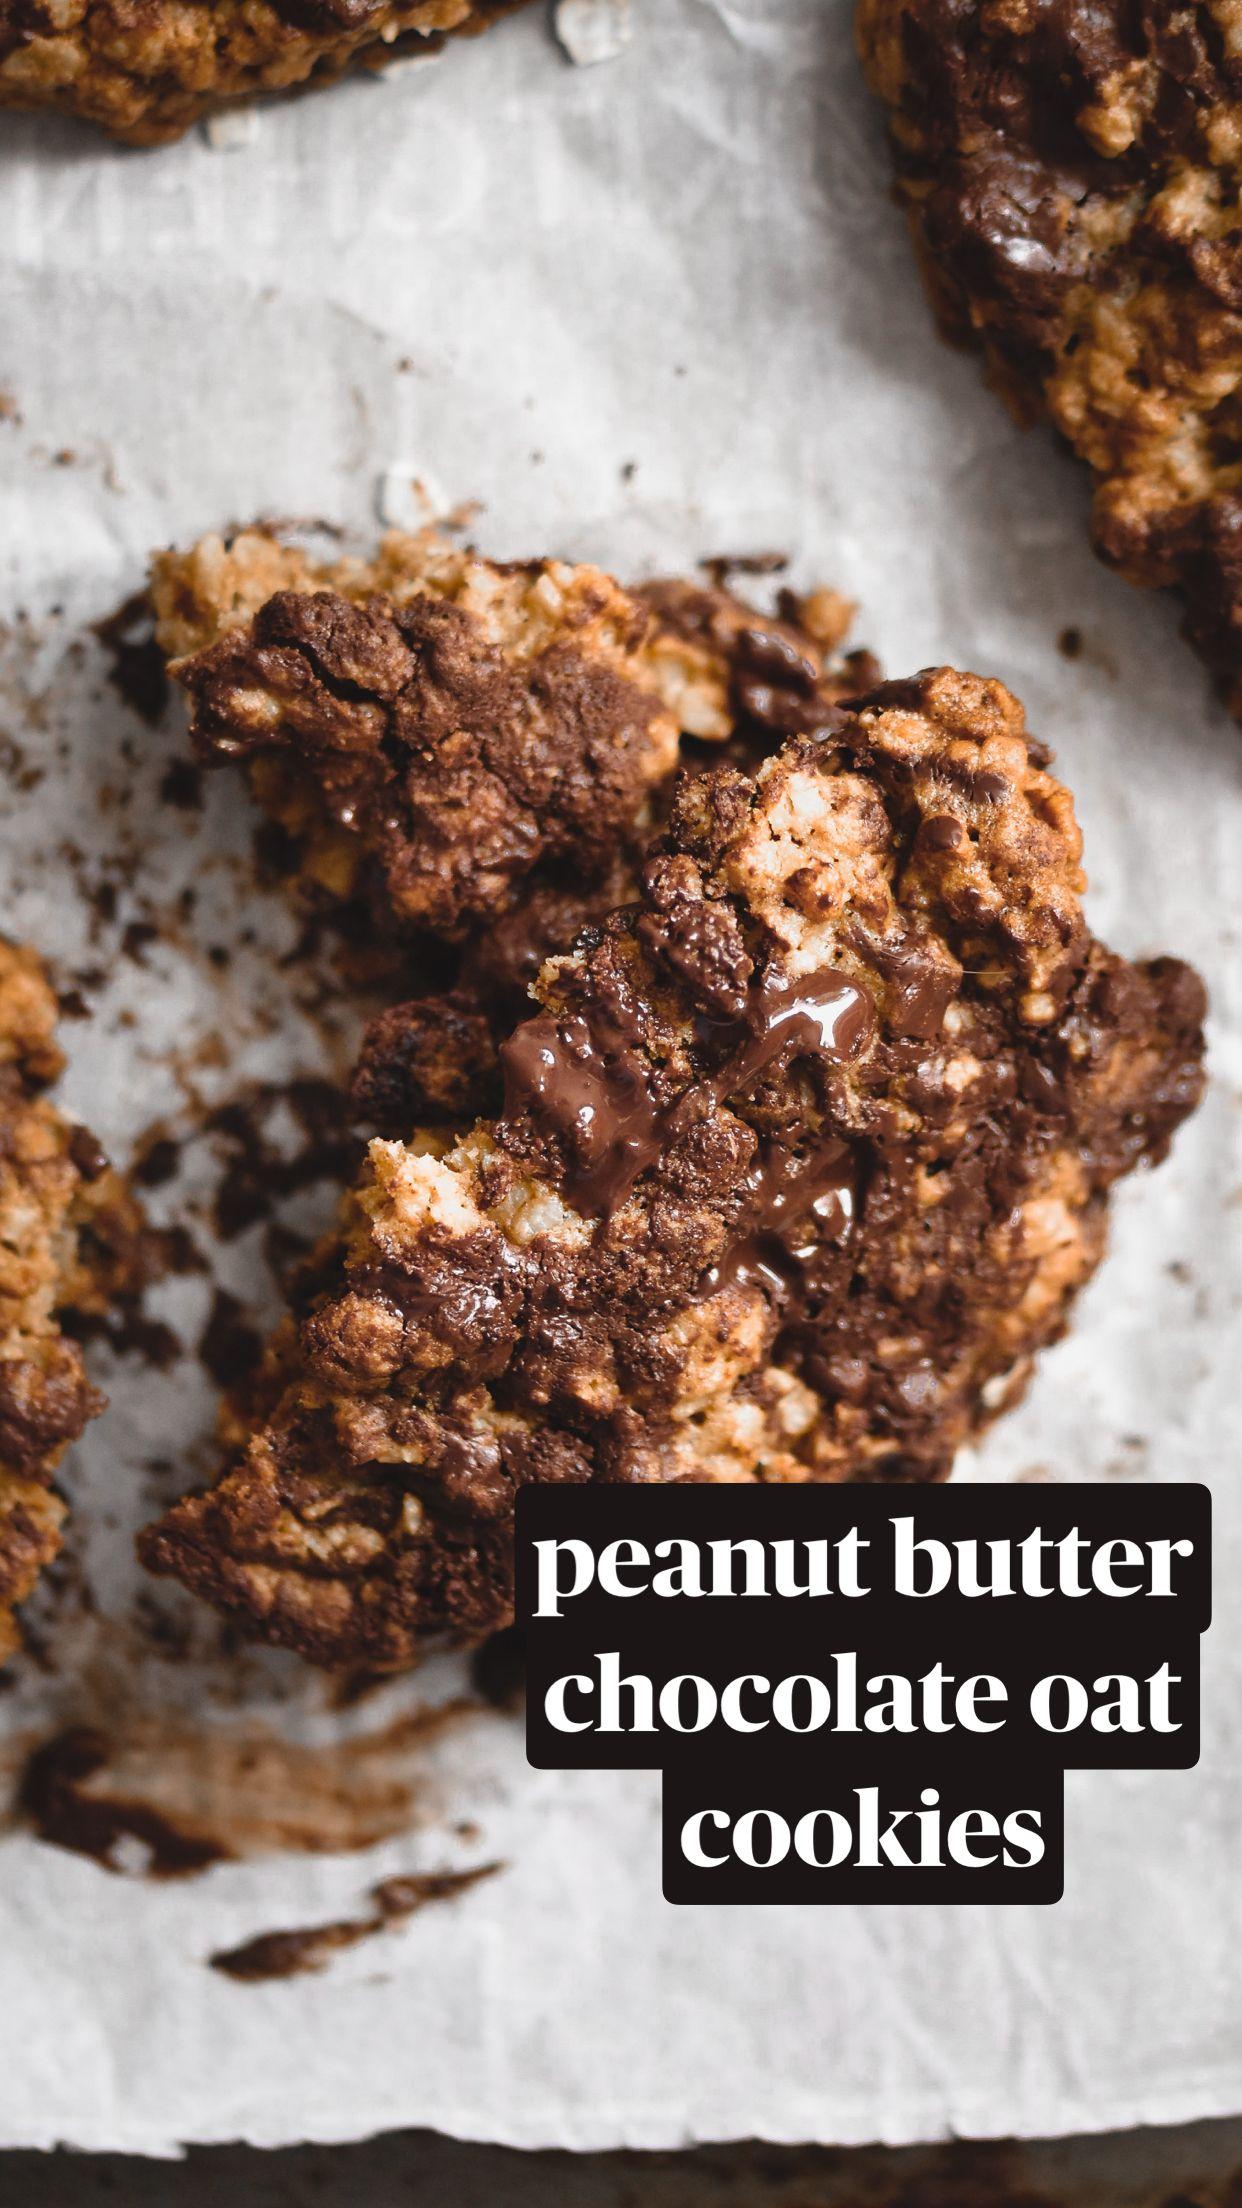 peanut butter chocolate oat cookies